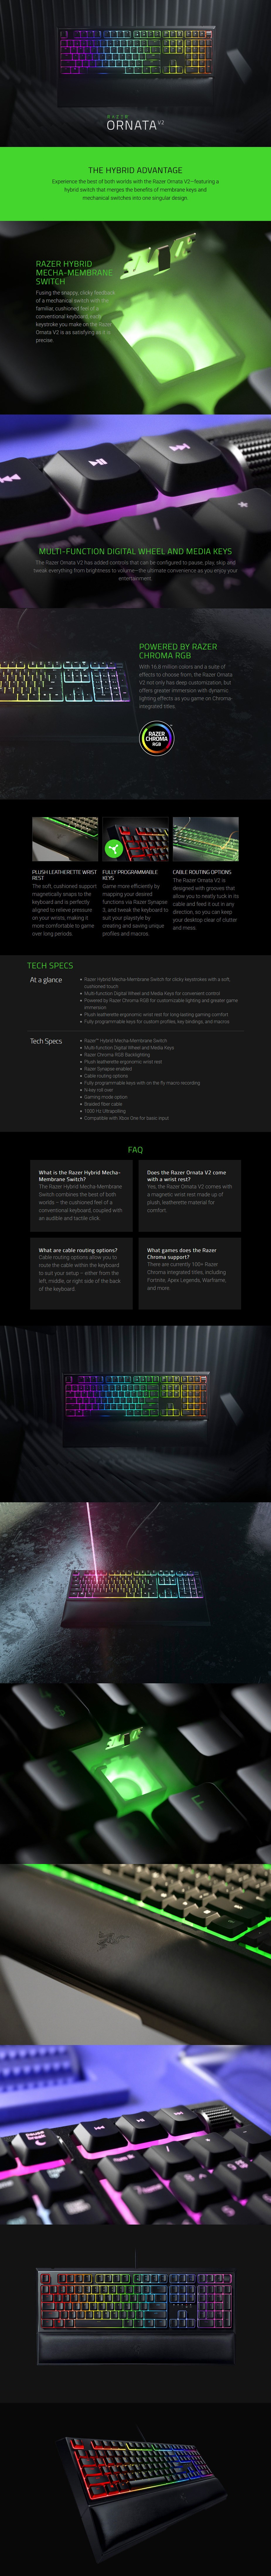 Razer Ornata V2 RGB Mem-chanical Gaming Keyboard - Overview 1